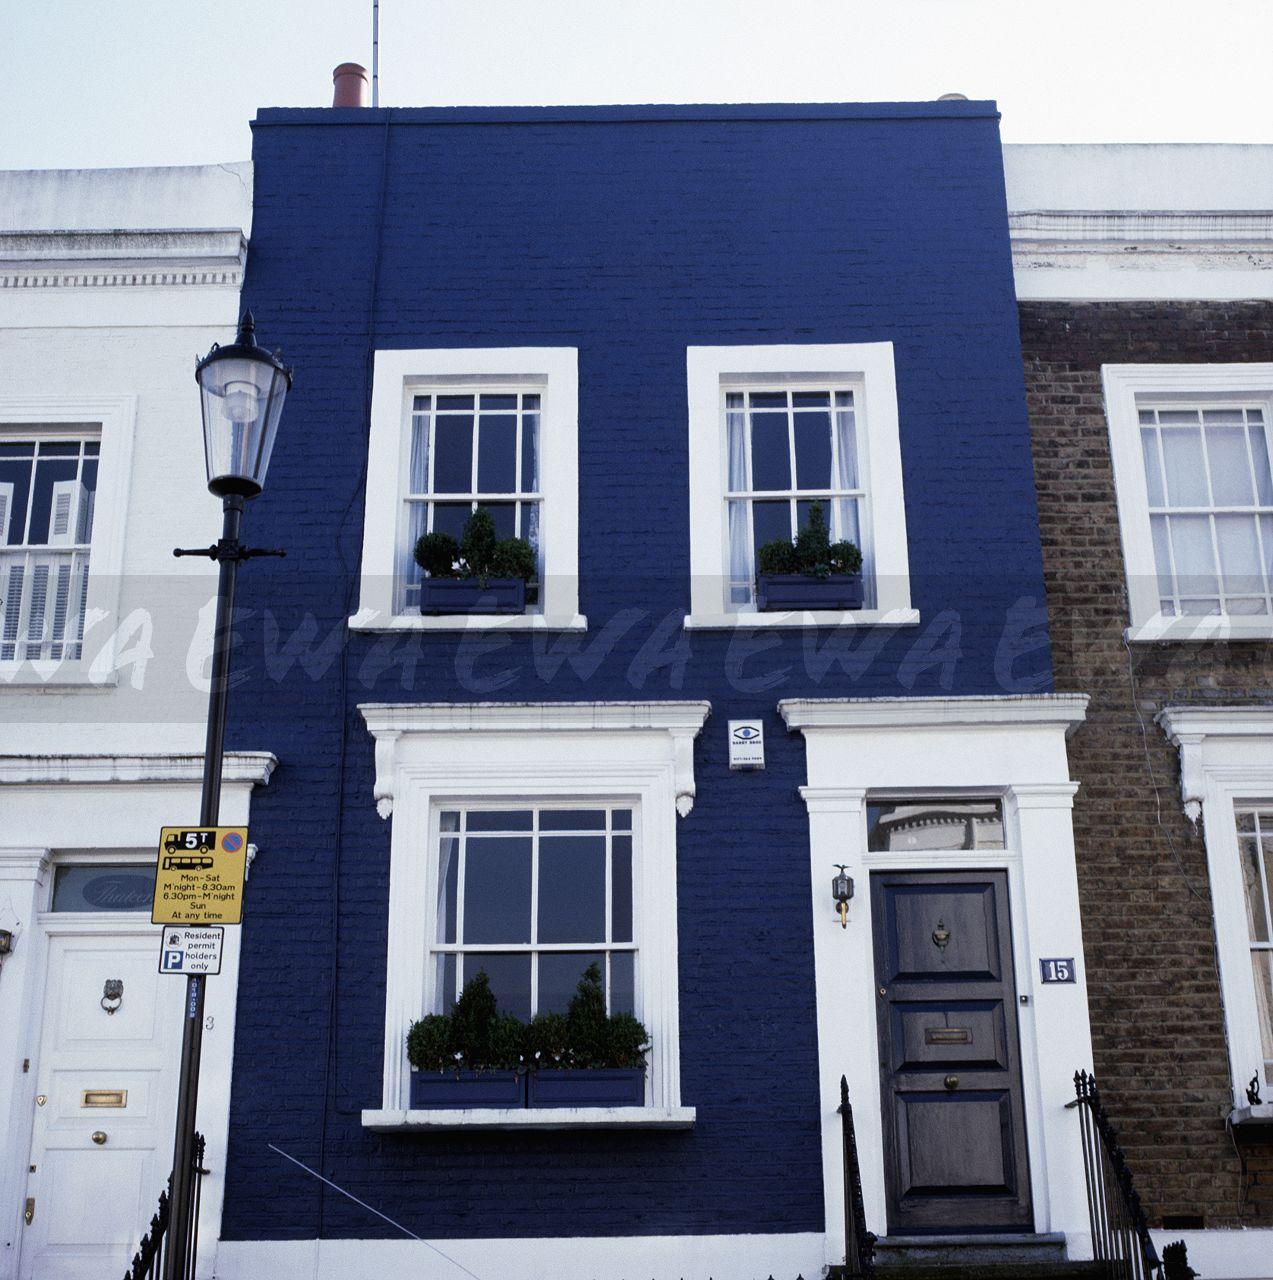 Image White Painted Window And Door Frmes Of Dark Blue